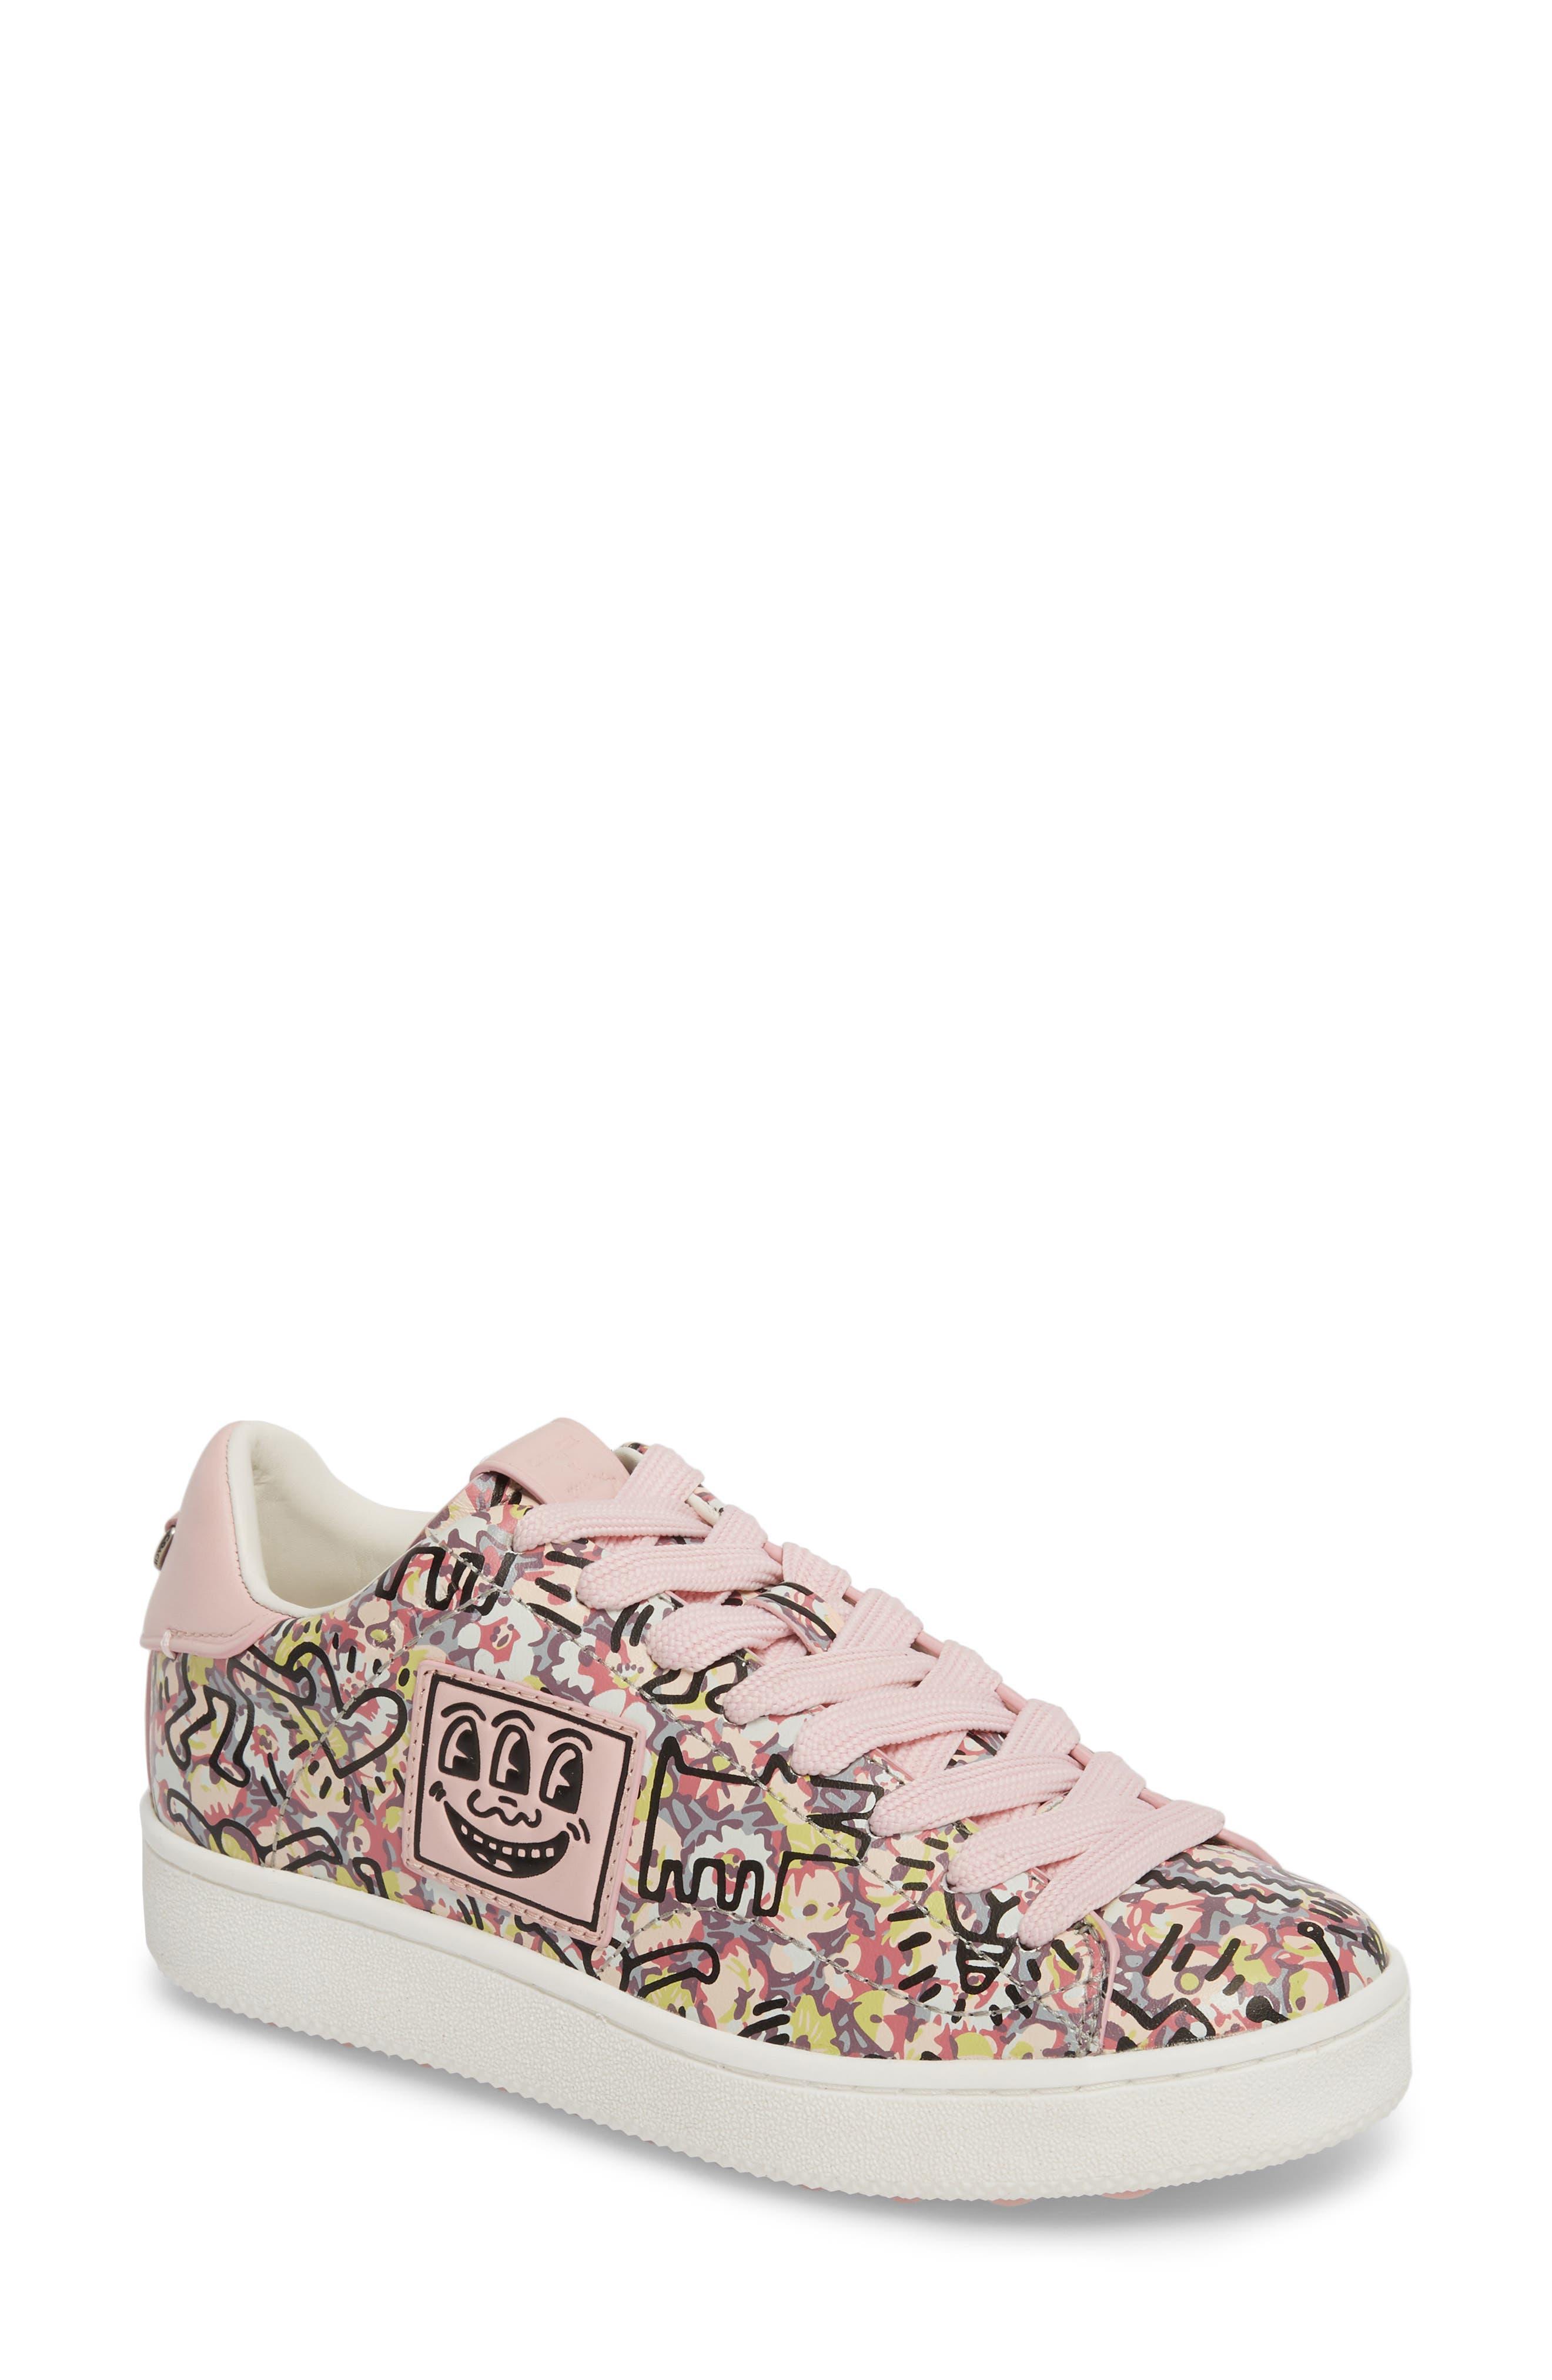 x Keith Haring Low Top Sneaker,                         Main,                         color,